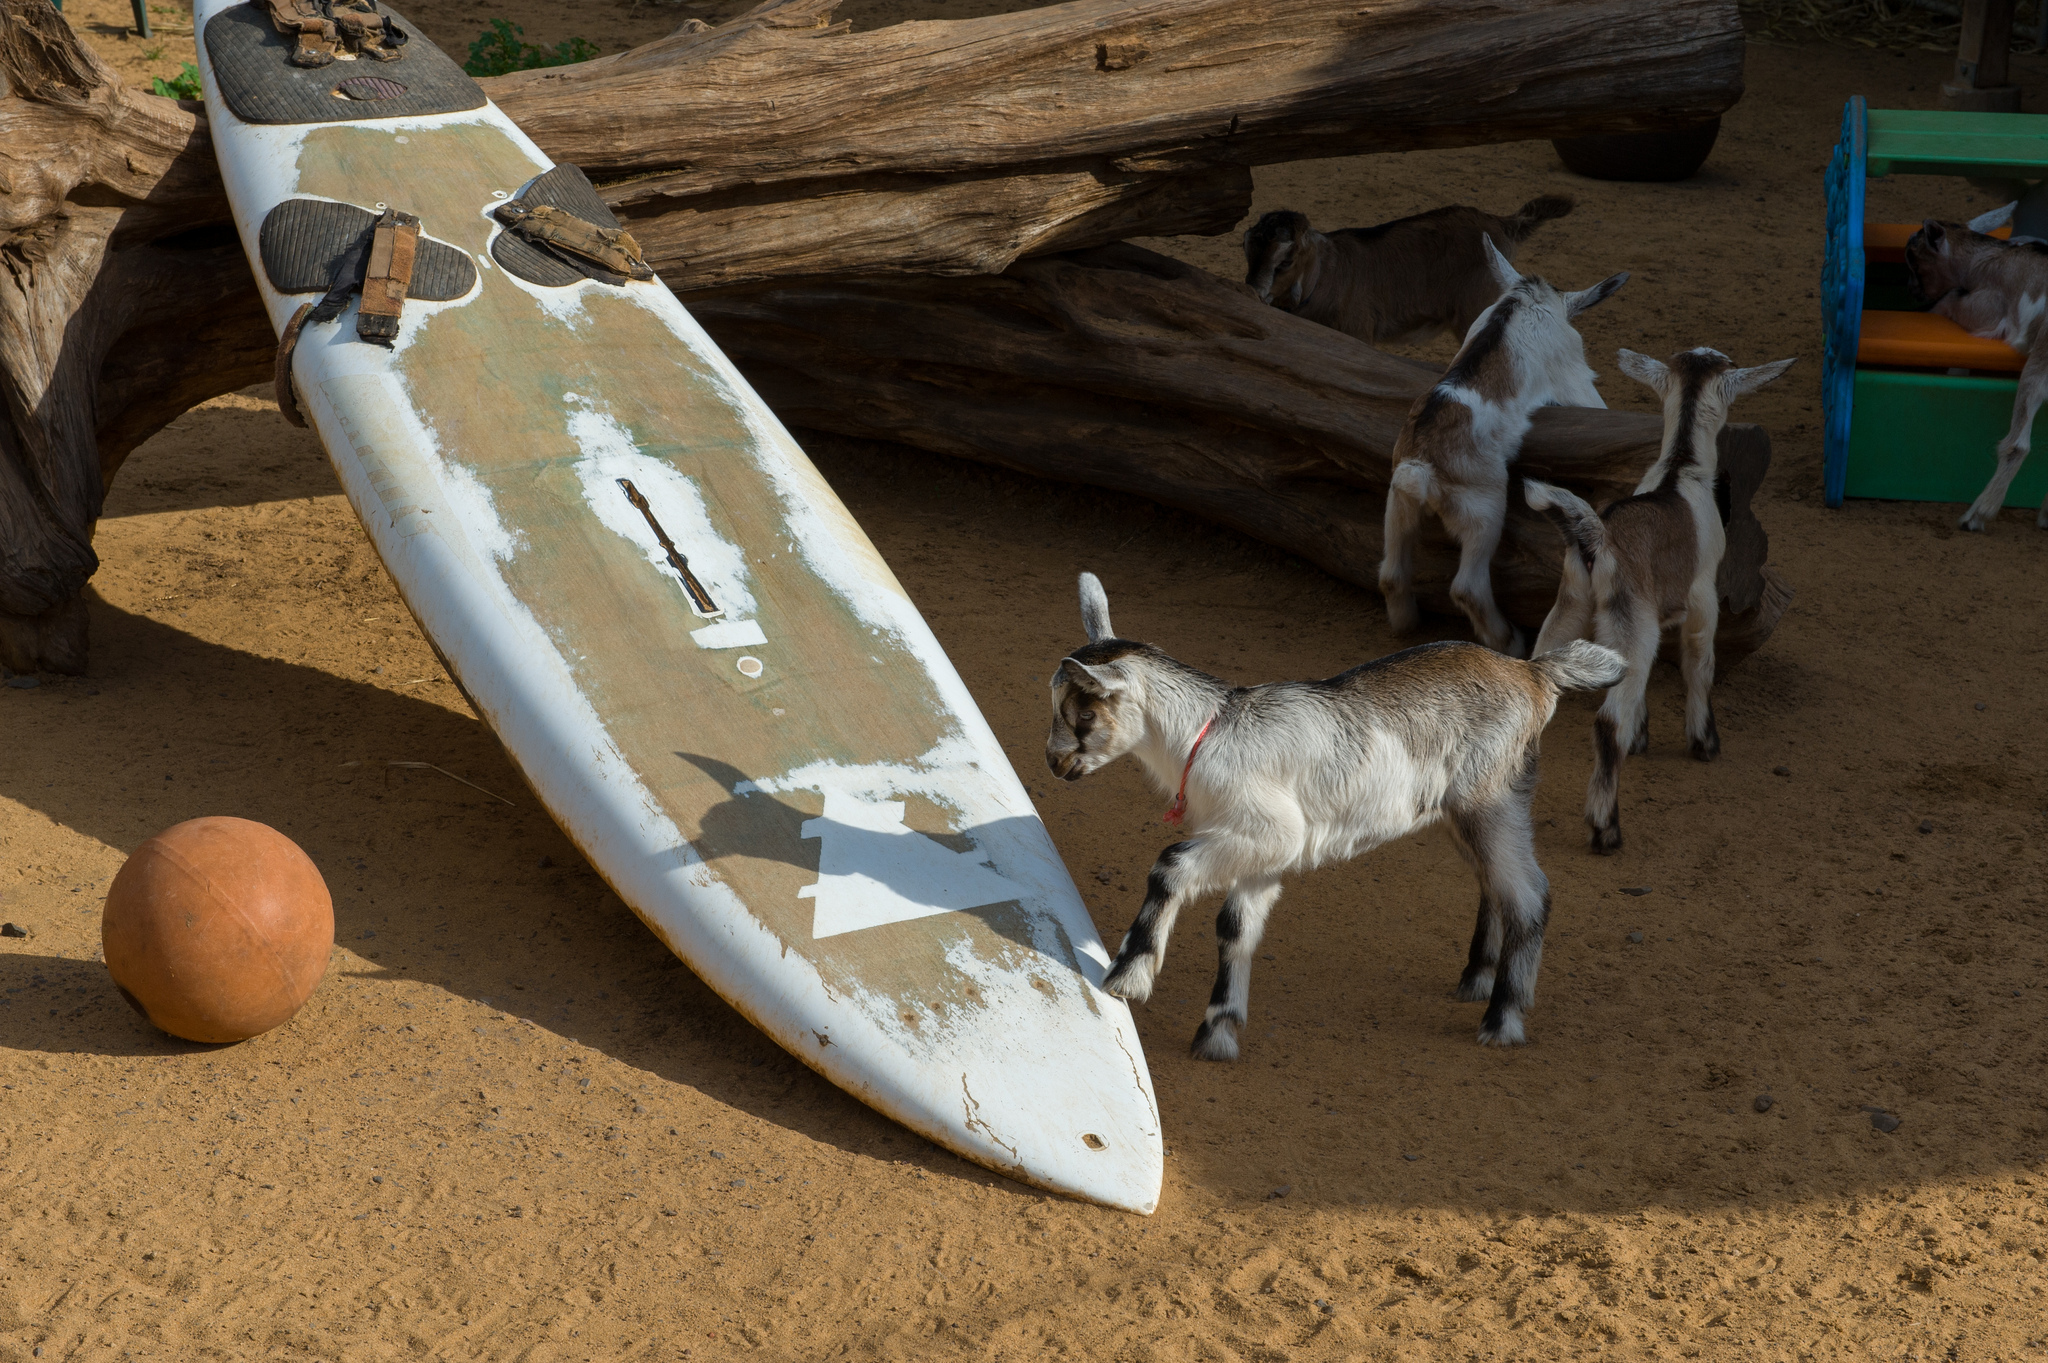 Surfing Goat Dairy Farm off Omaopio Road. Photo courtesy of Brian Lauer.